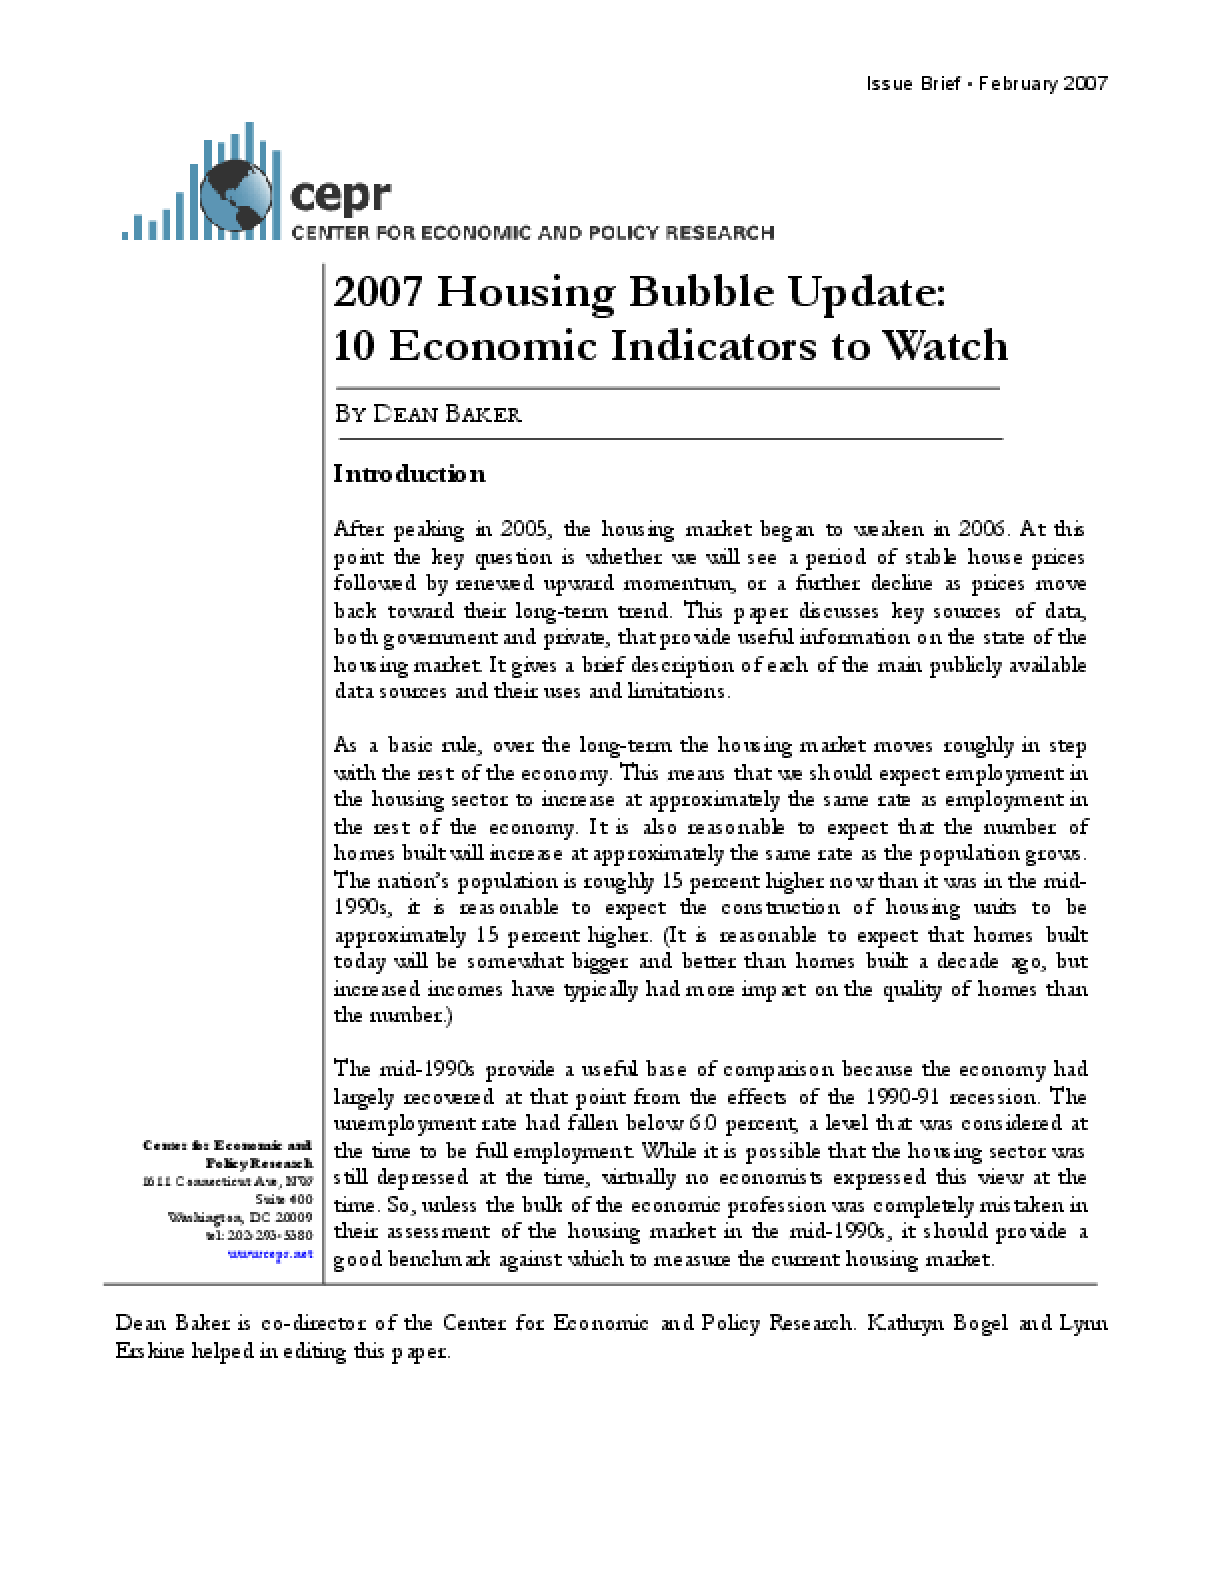 2007 Housing Bubble Update: 10 Economic Indicators to Watch